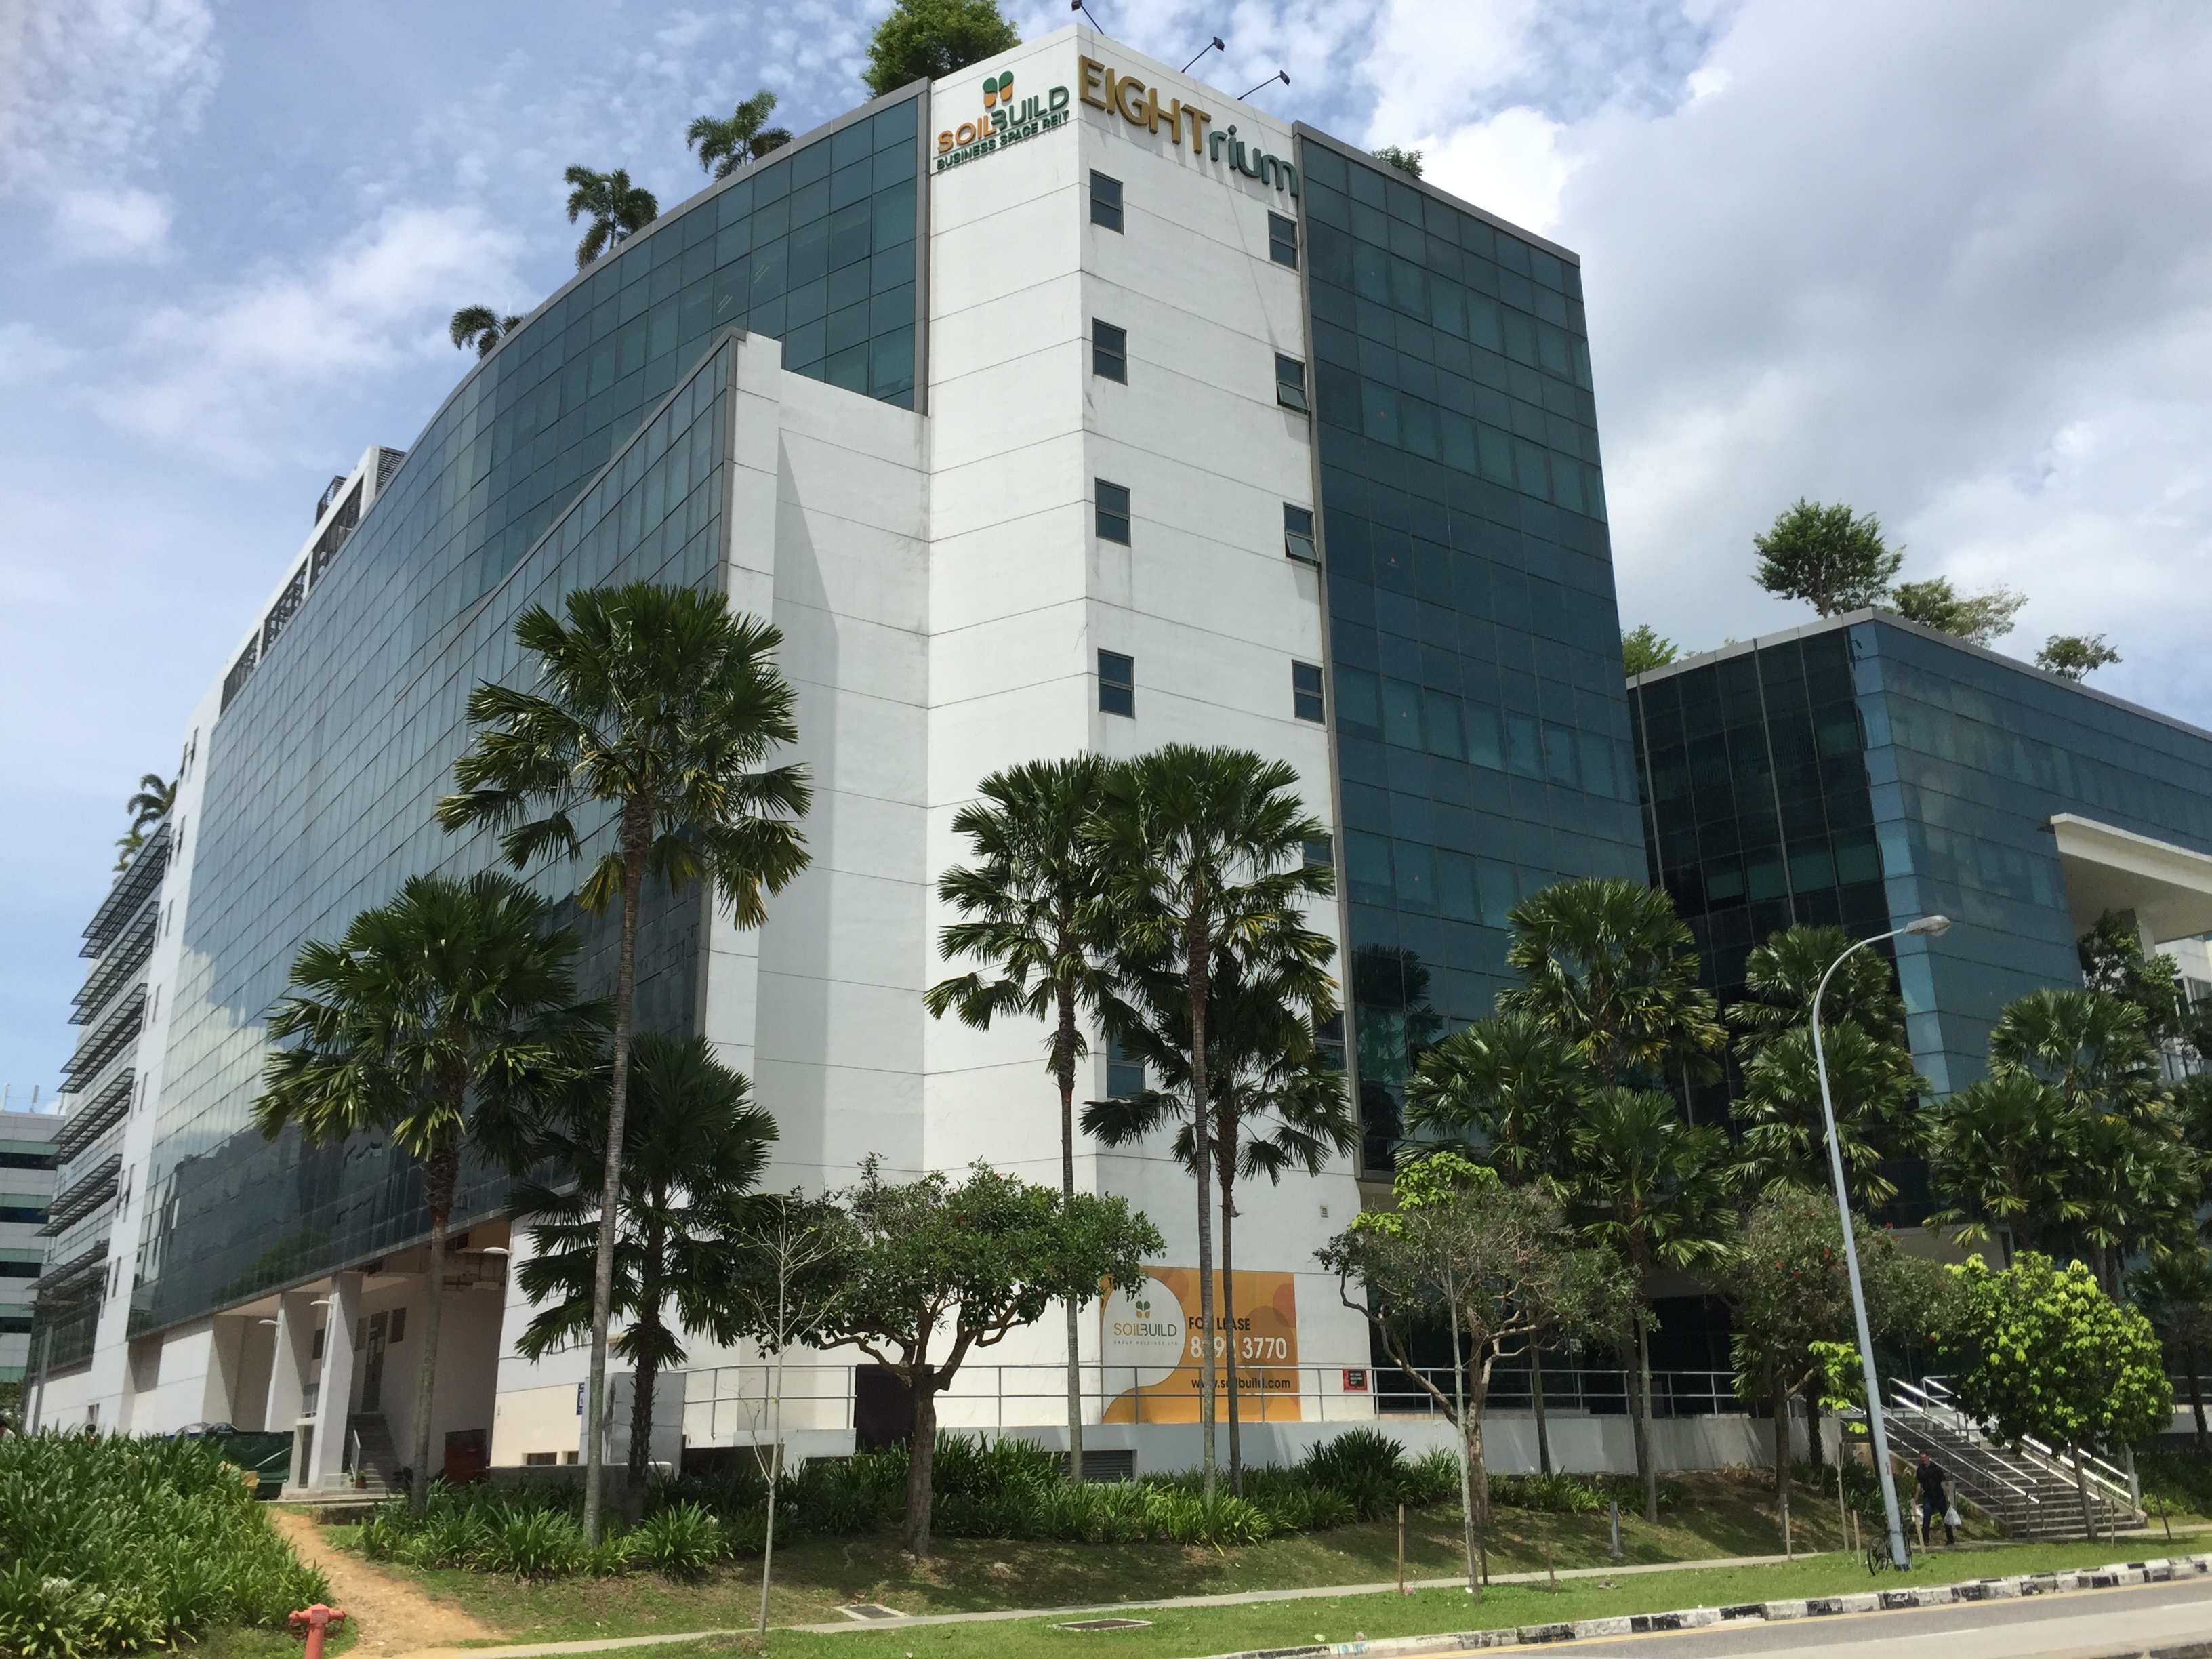 Soilbuild Business Space REIT's Eightrium @ Changi Business Park (Photo: REITsWeek)